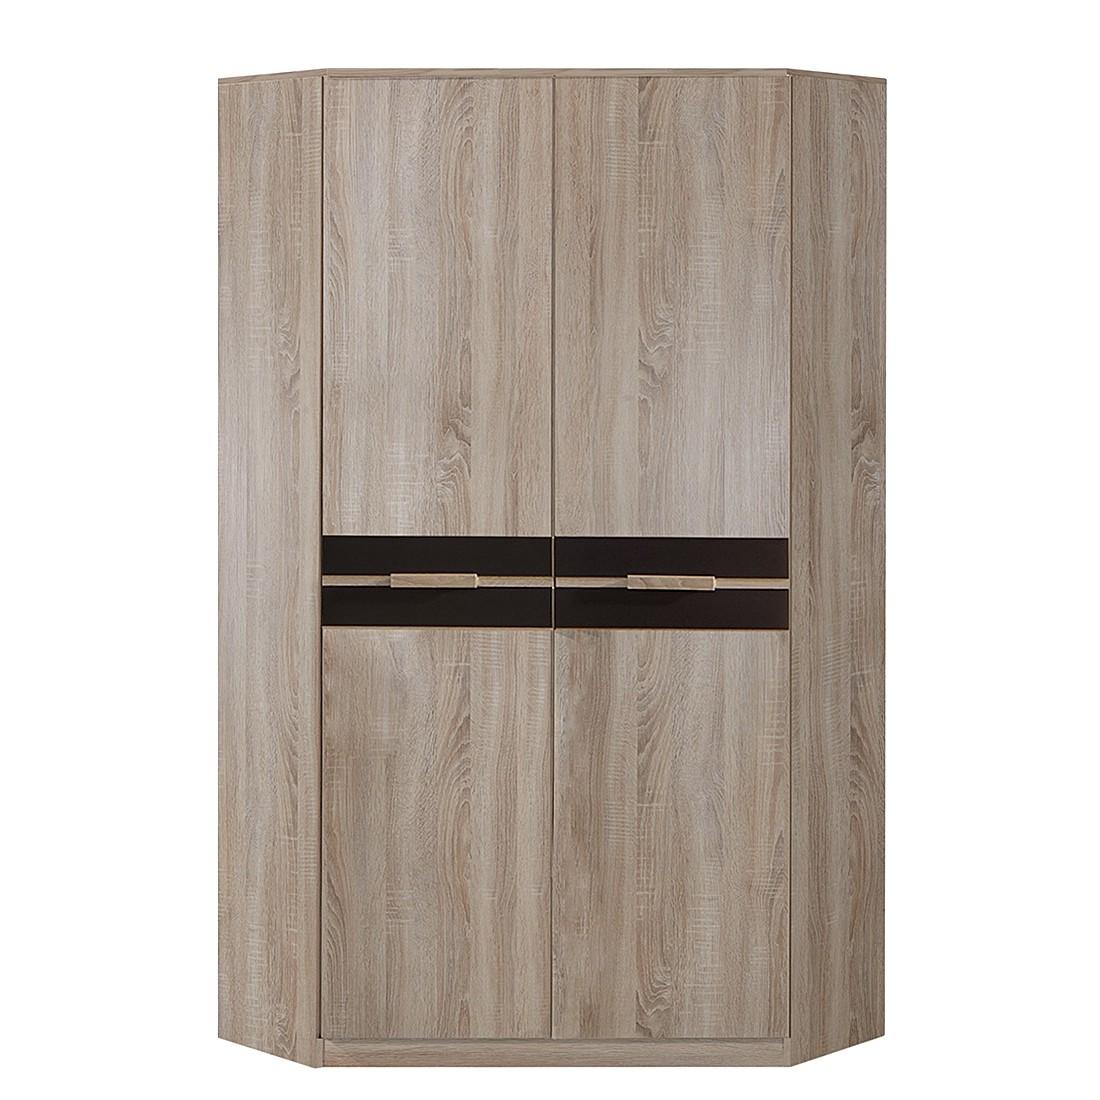 Hoekkast Fame (2-deurs) grof gezaagde eikenhouten look-lavasteenkleurig, Wimex